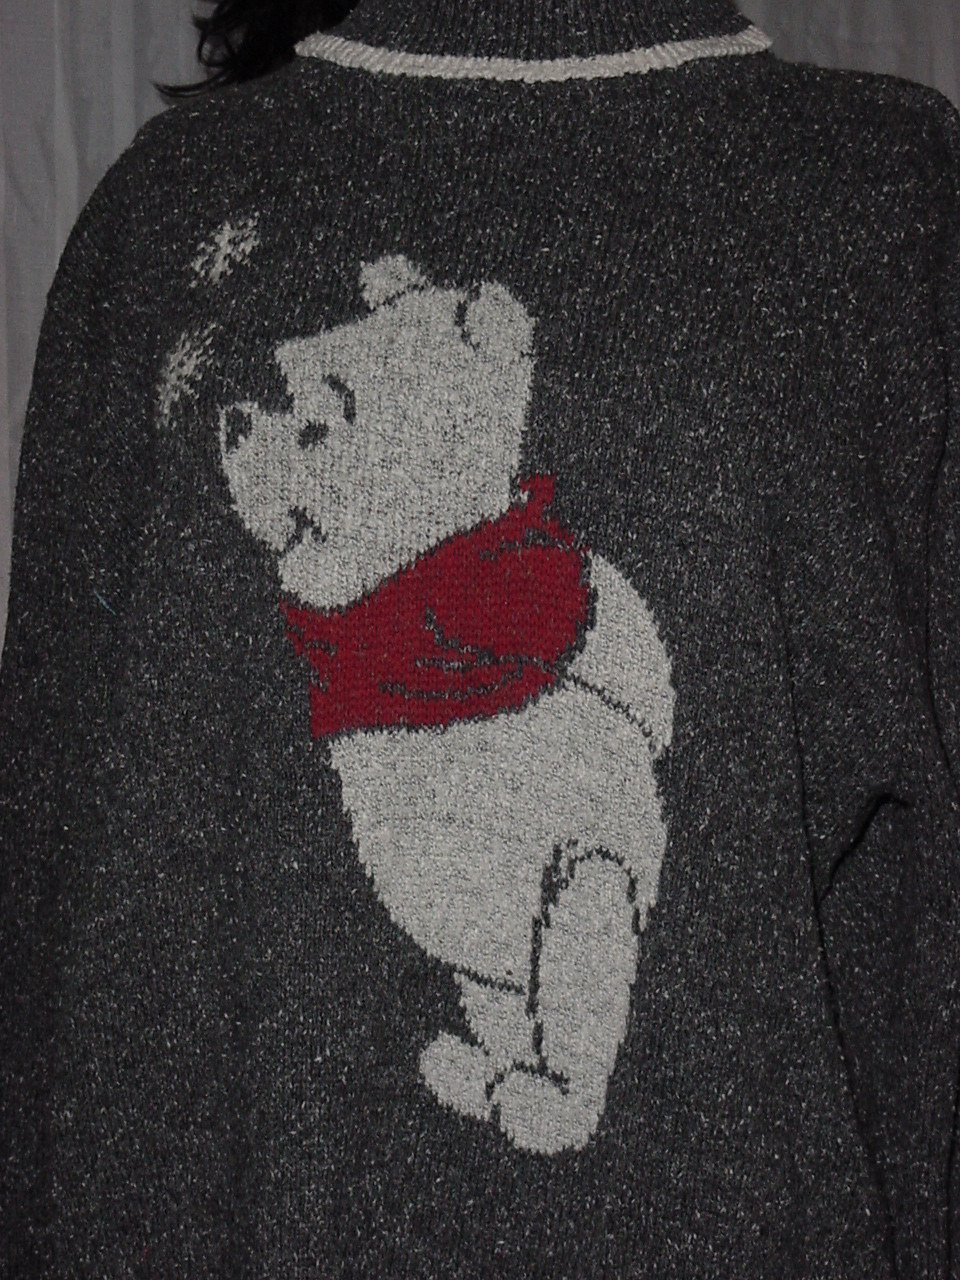 Winnie the Pooh Gray Woman's Sweater Size XXL The Disney Store No 240